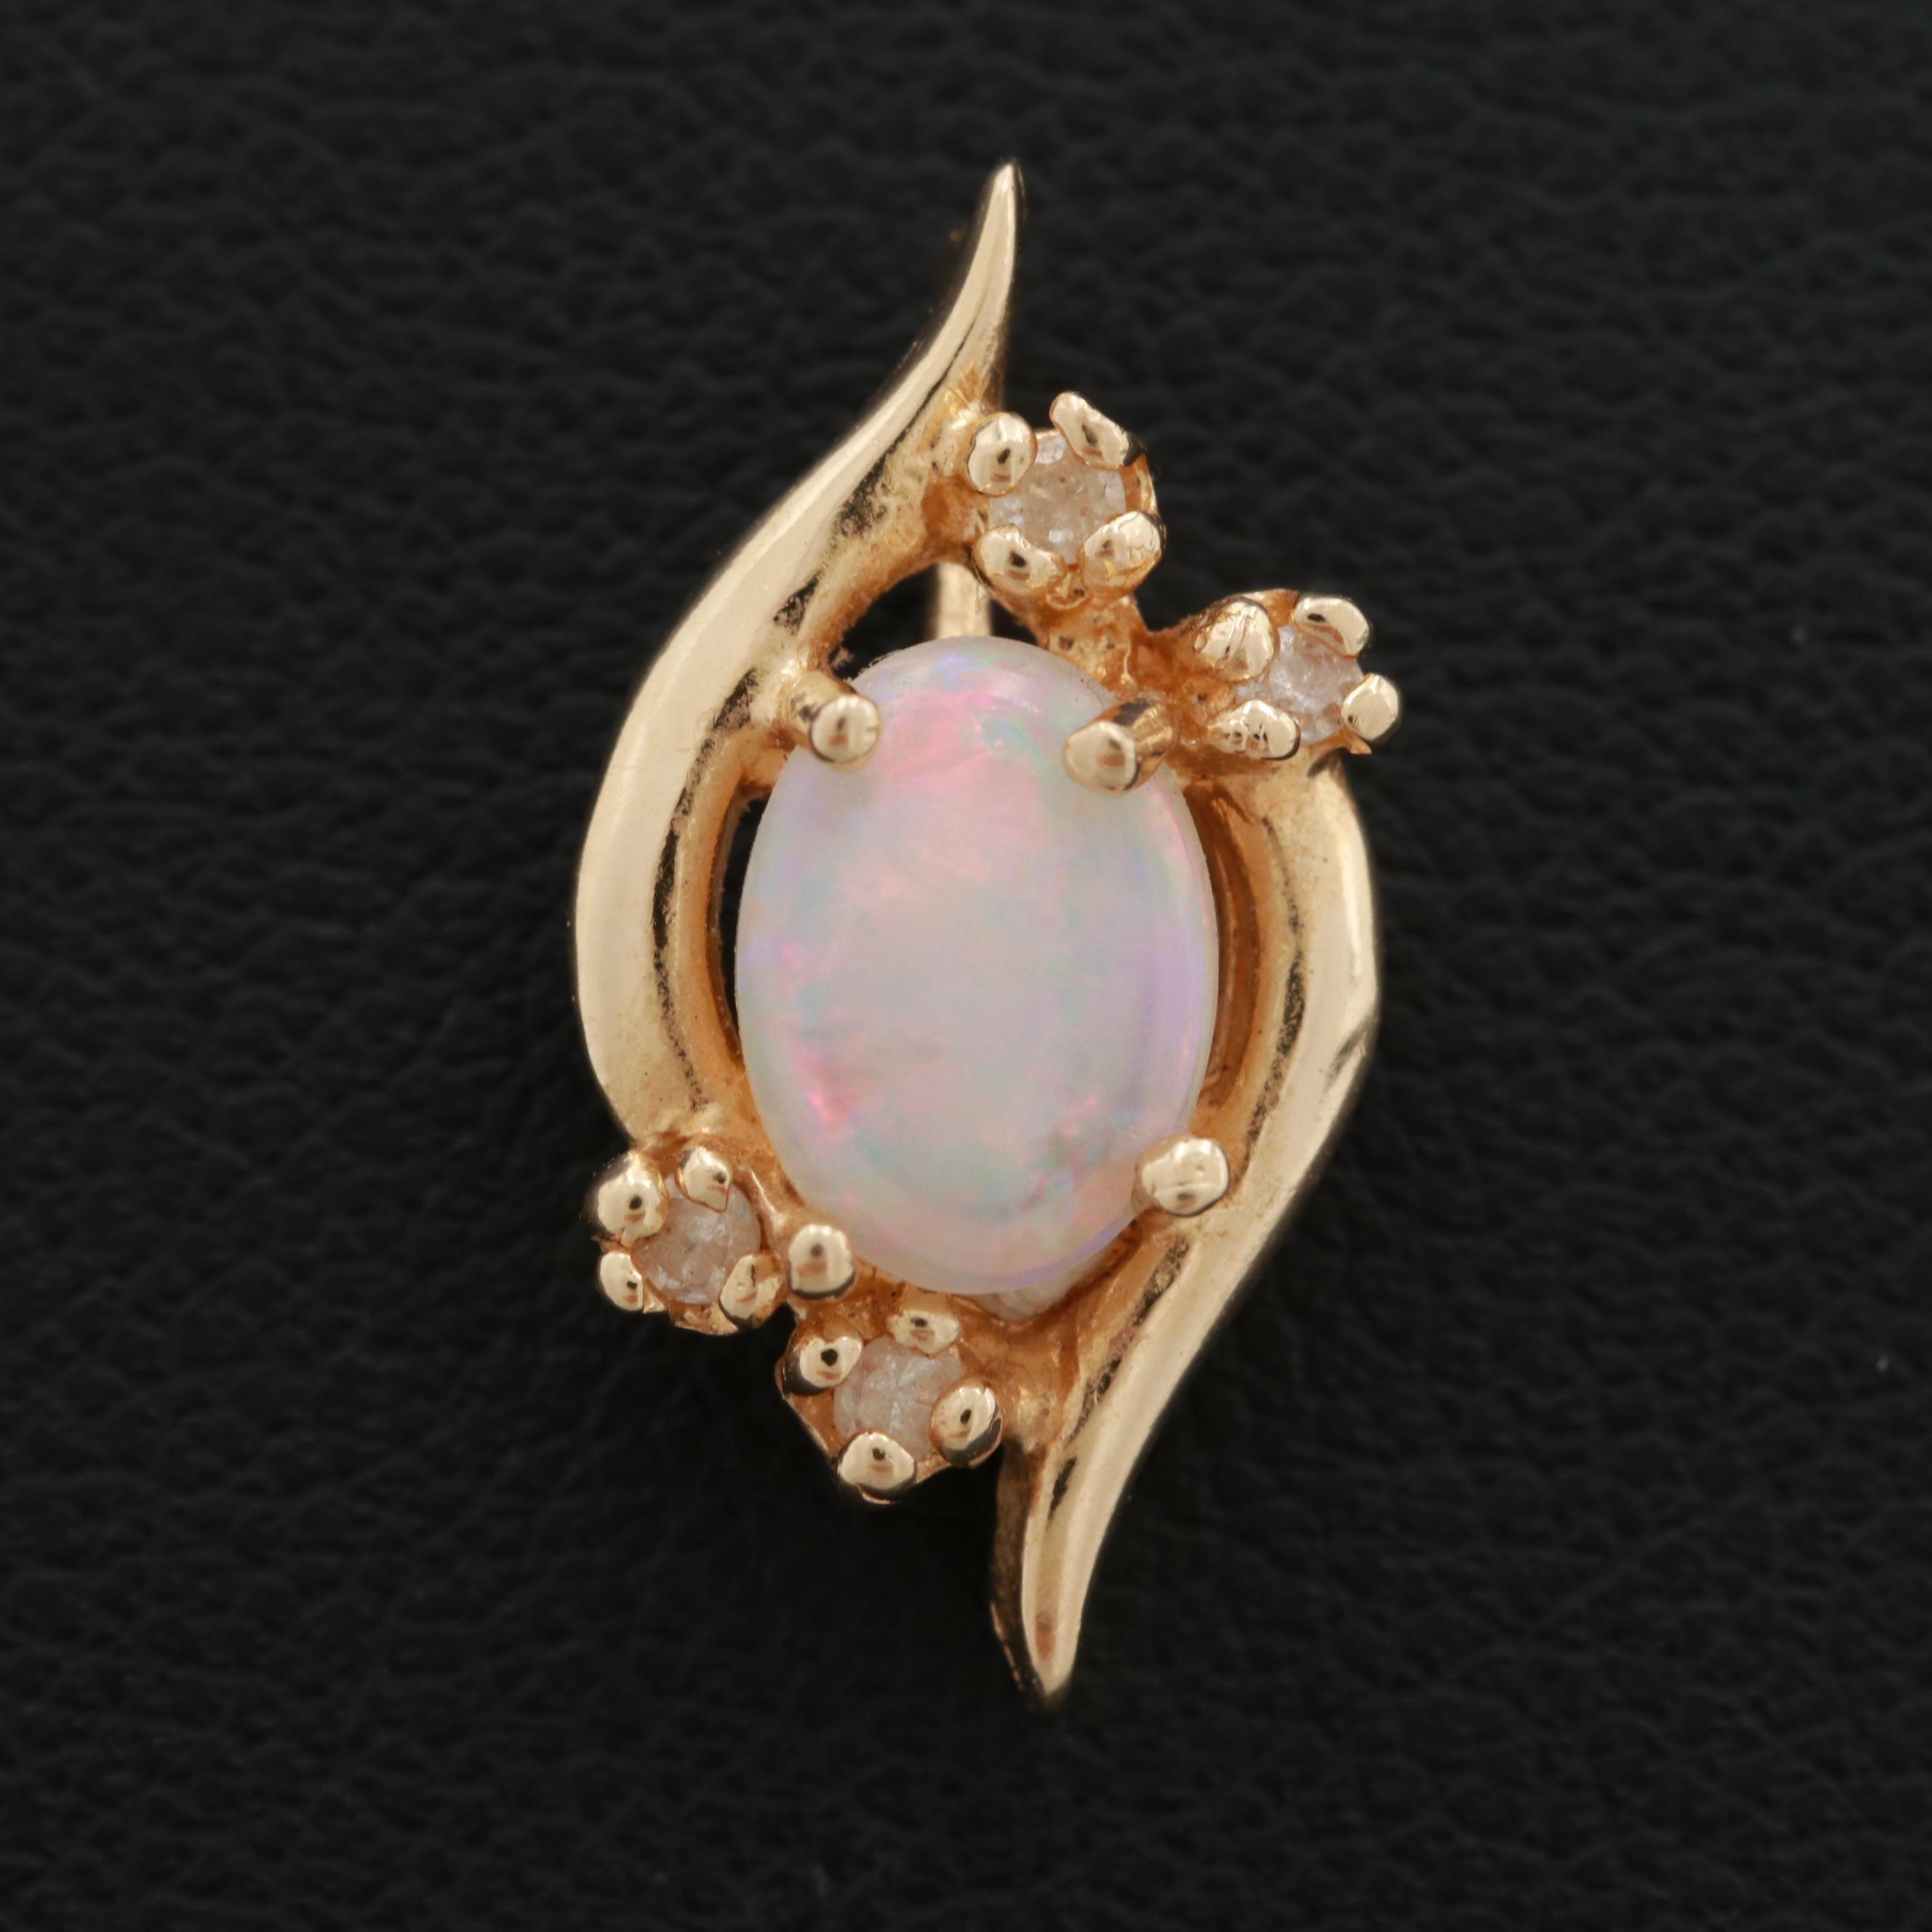 14K Yellow Gold Diamond and Opal Pendant